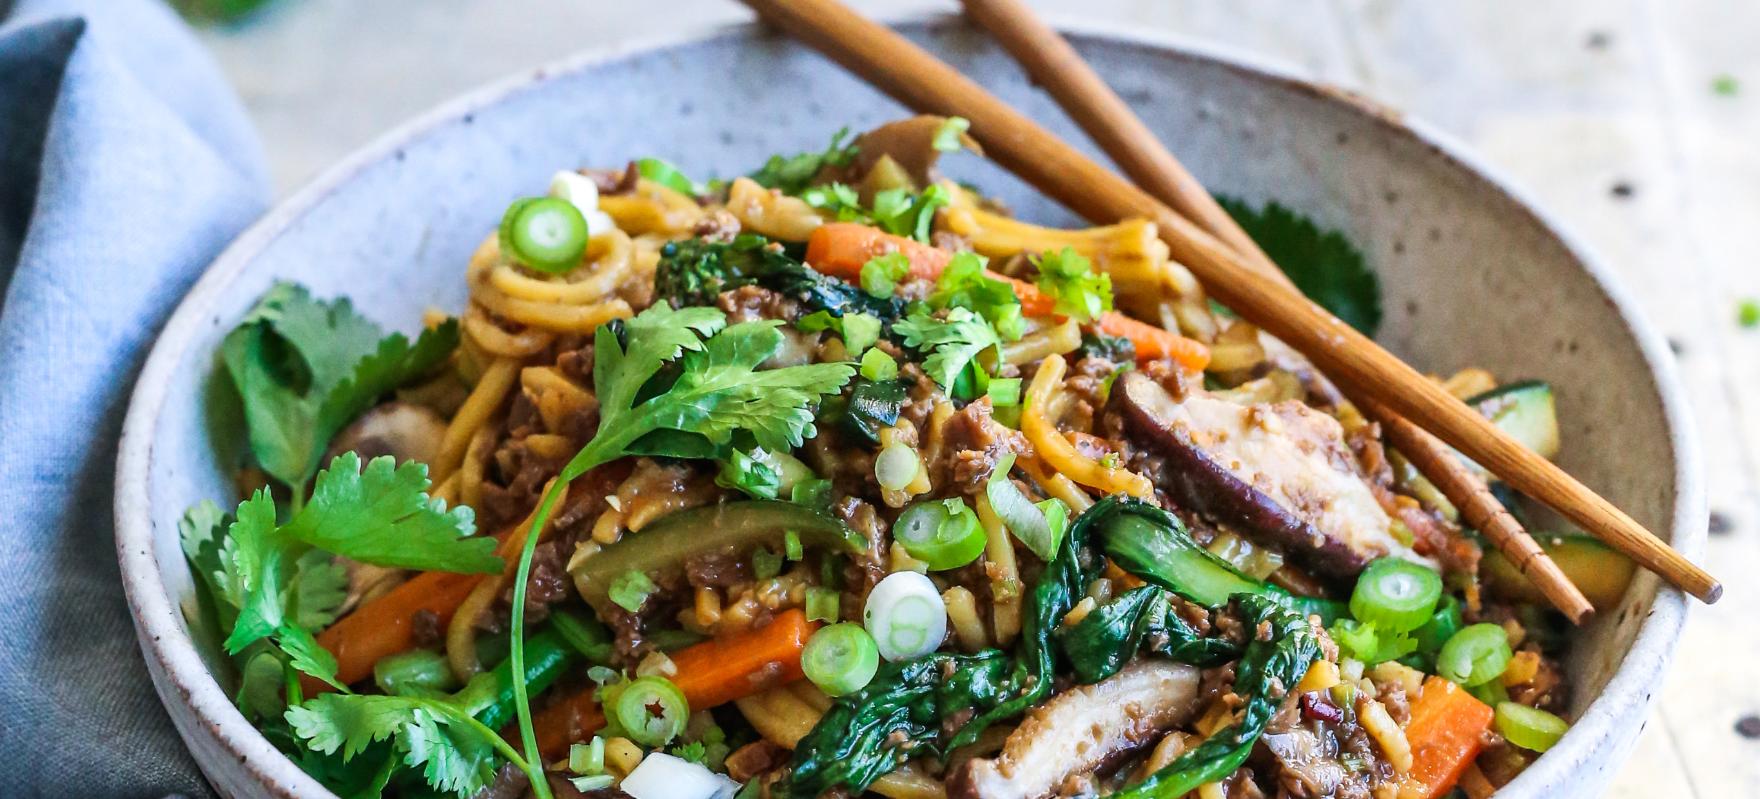 Hokkien noodles stir fry image 1